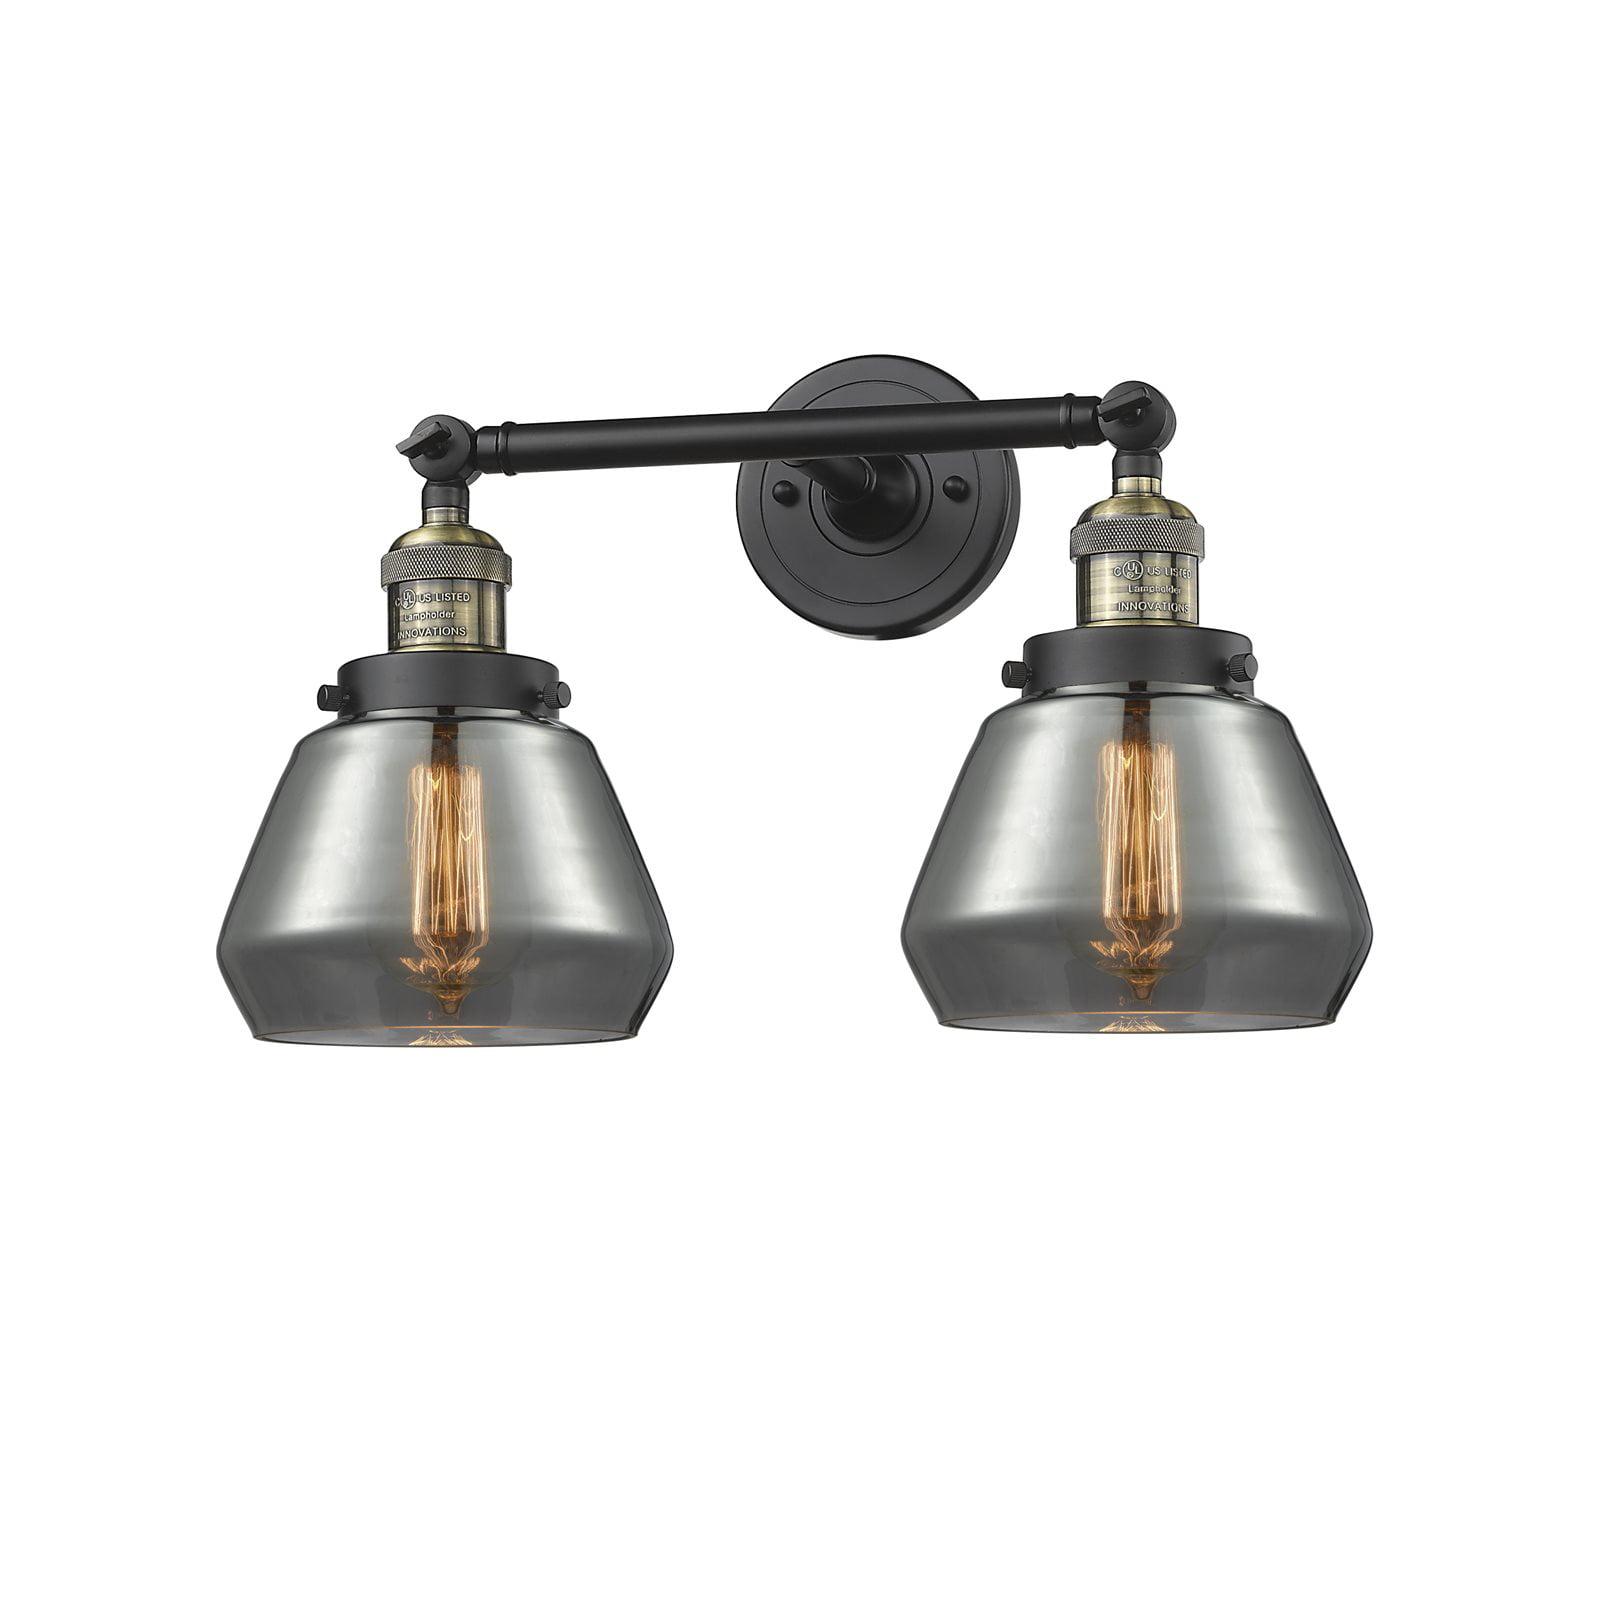 "Innovations 2-LT LED Fulton 16.5"" Bathroom Fixture Black Antique Brass 208-BAB-G173-LED by"